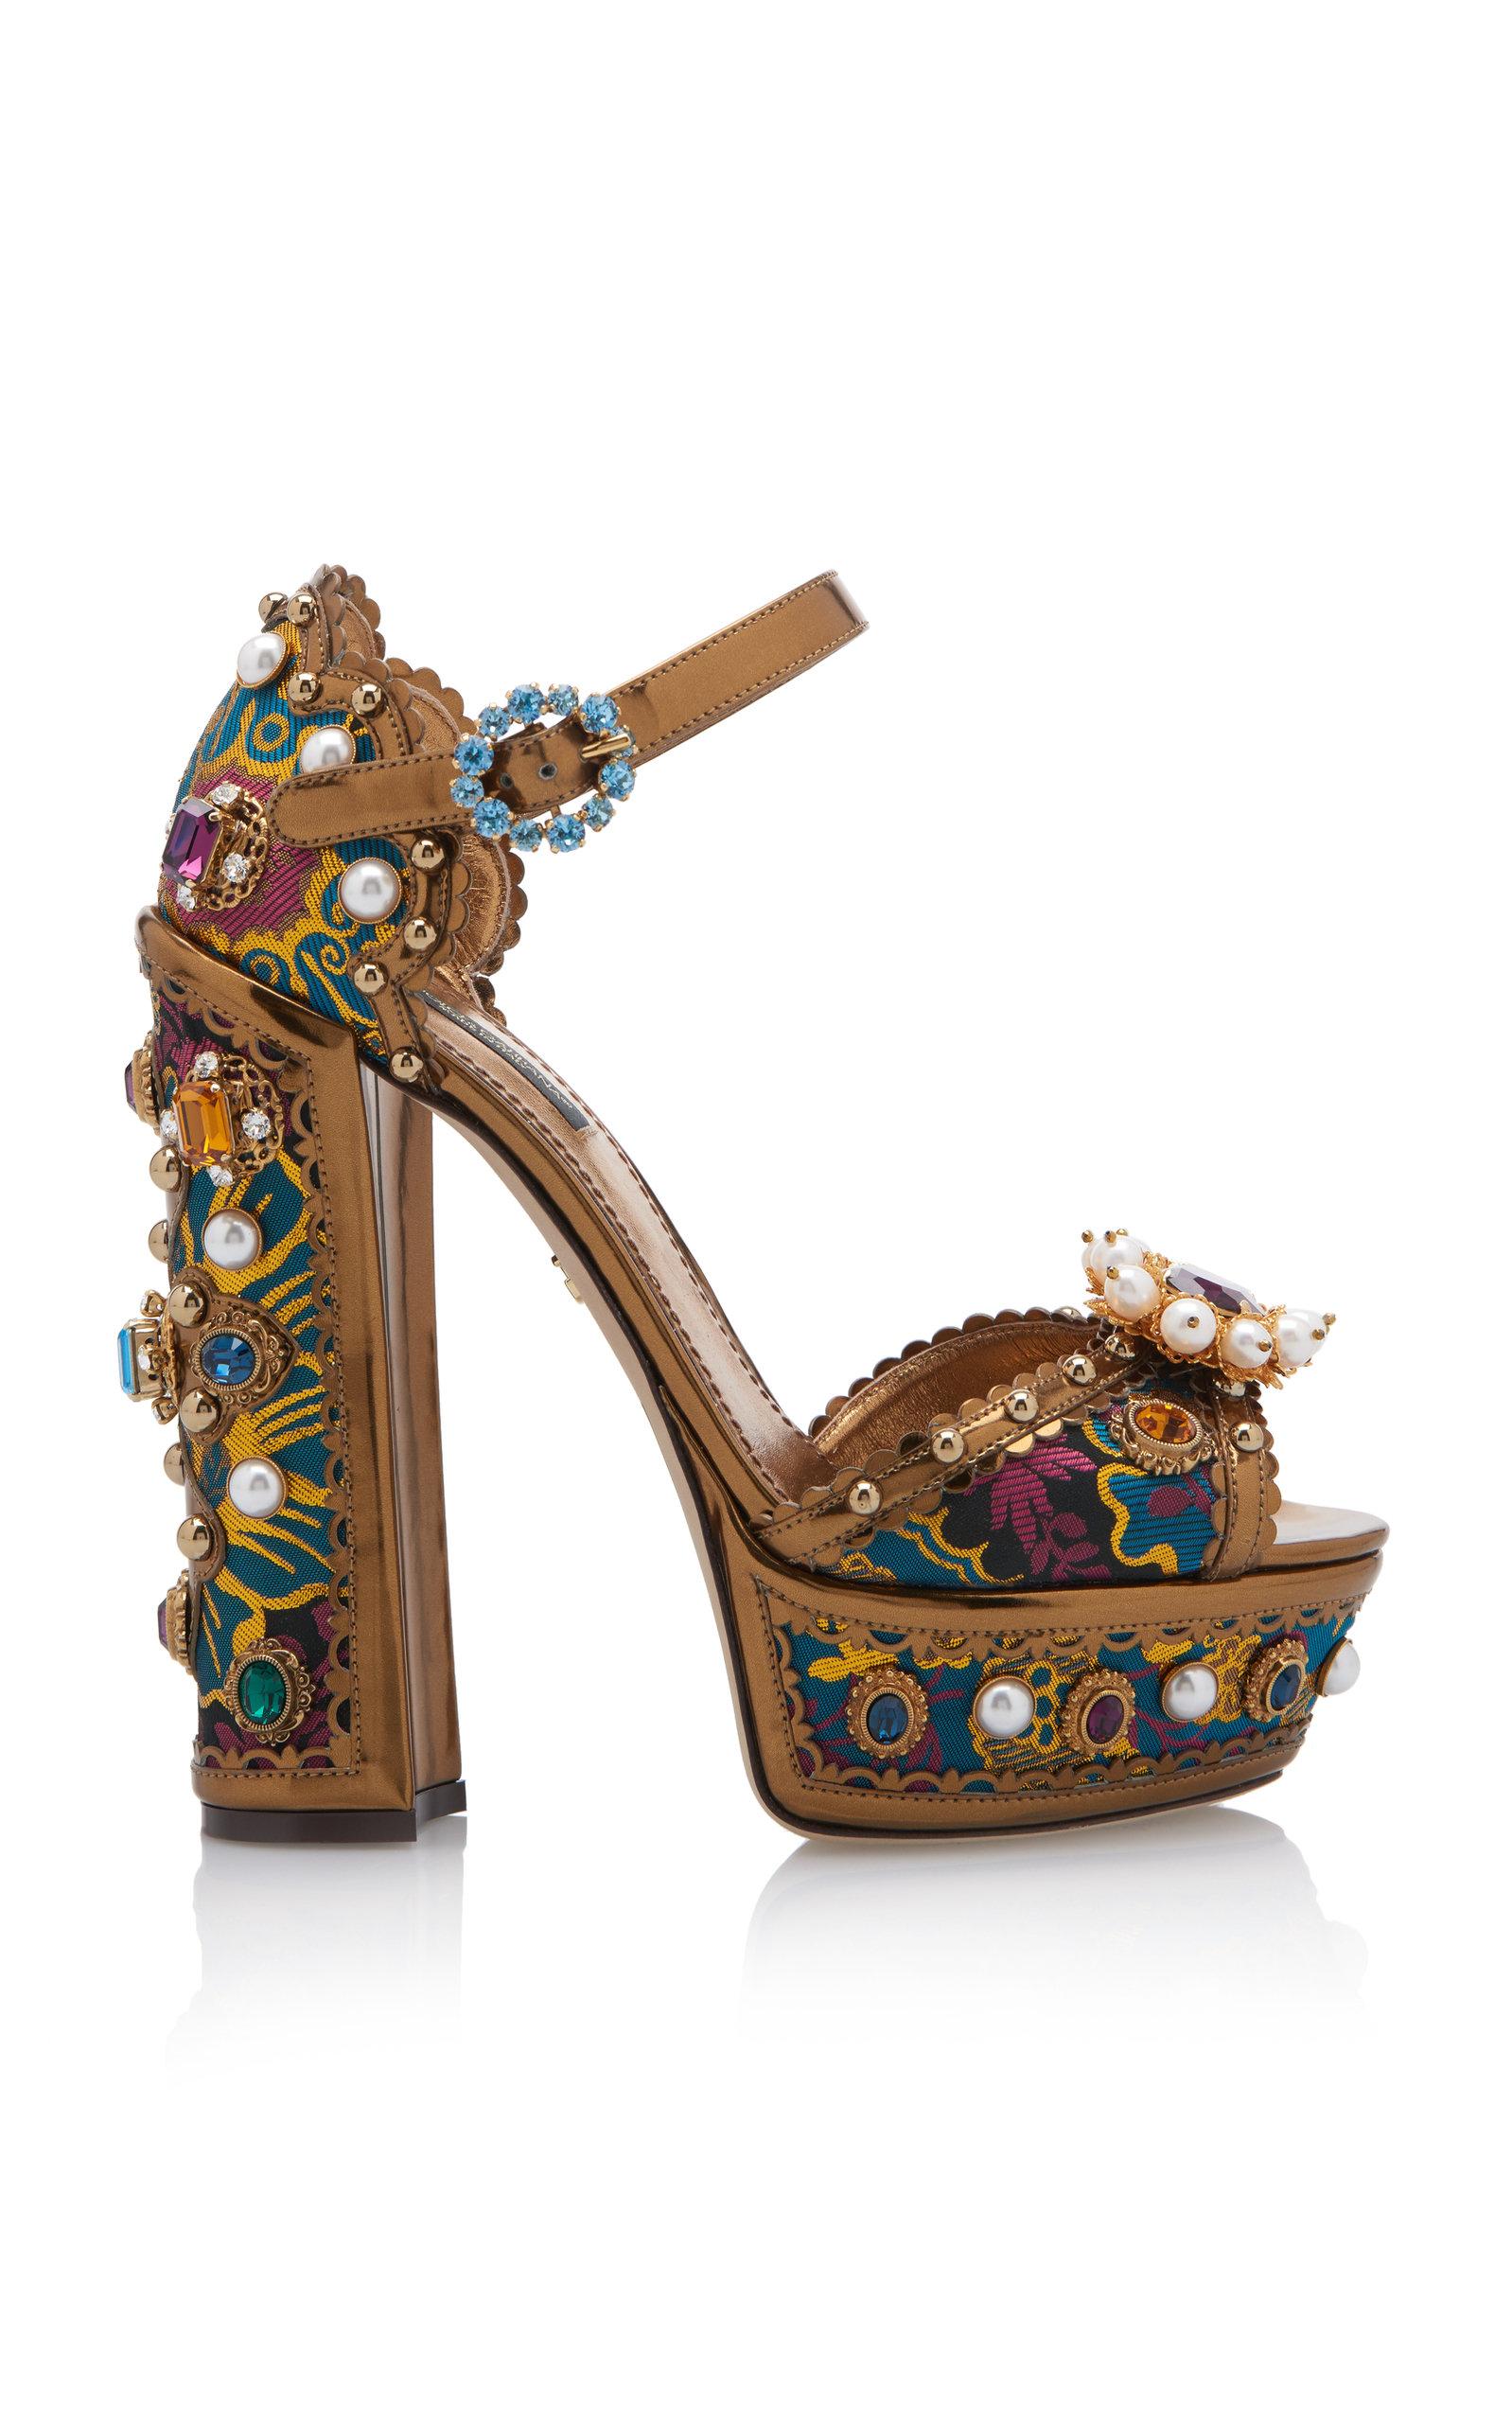 b5f6ca07697e Dolce   GabbanaJewel-Embellished Metallic Leather Platform Sandals. CLOSE.  Loading